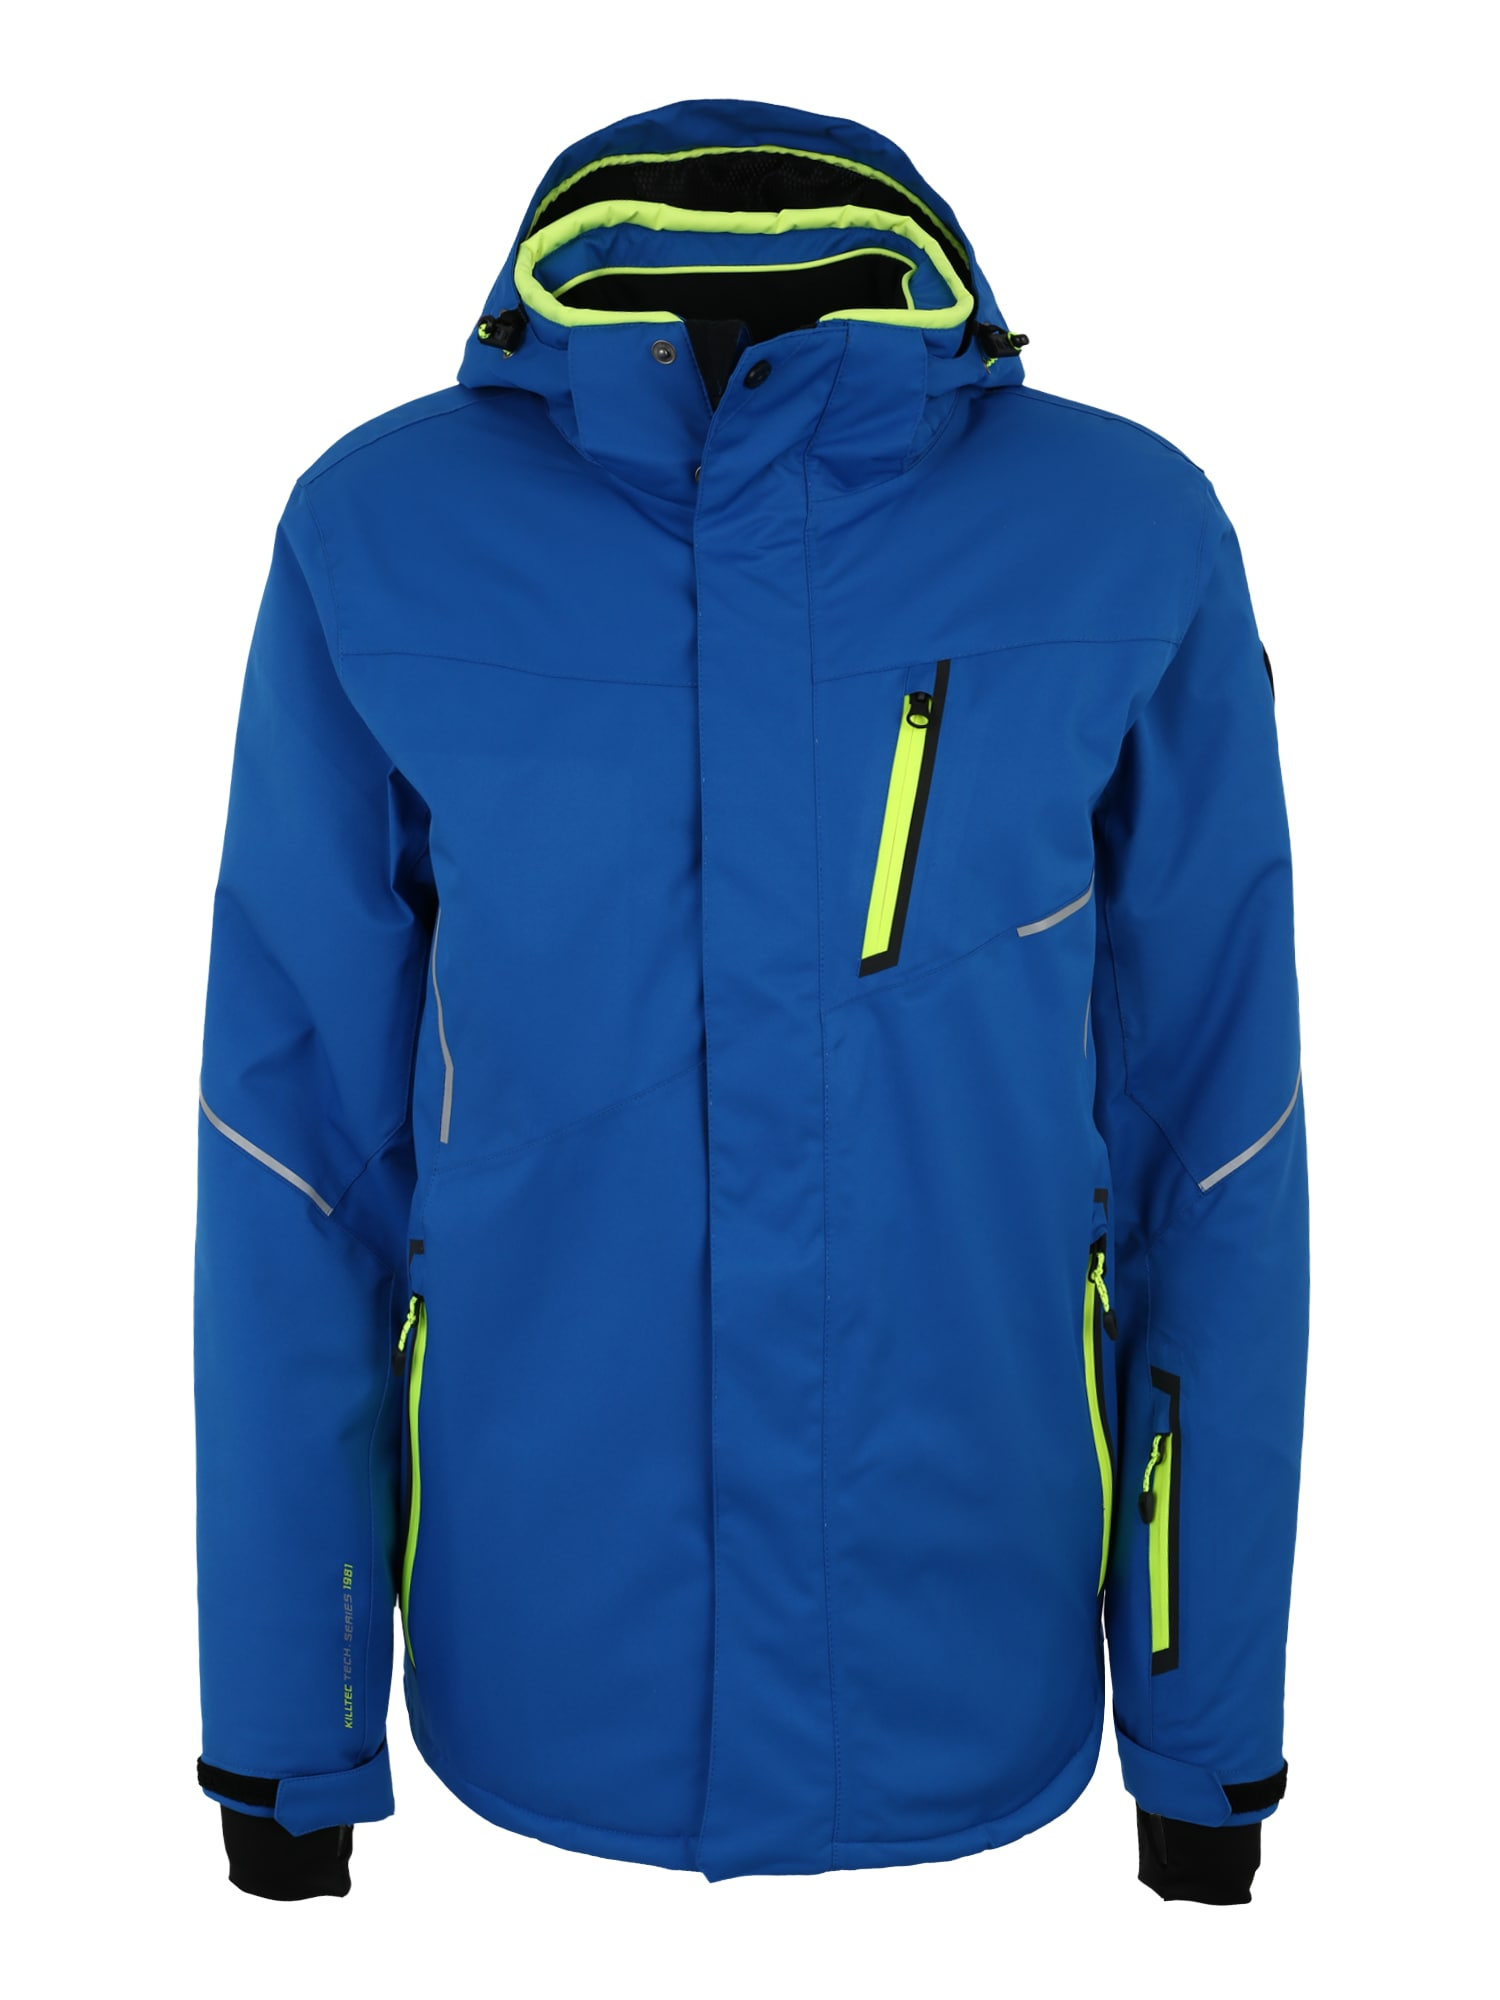 Outdoorová bunda Zoron modrá žlutá KILLTEC